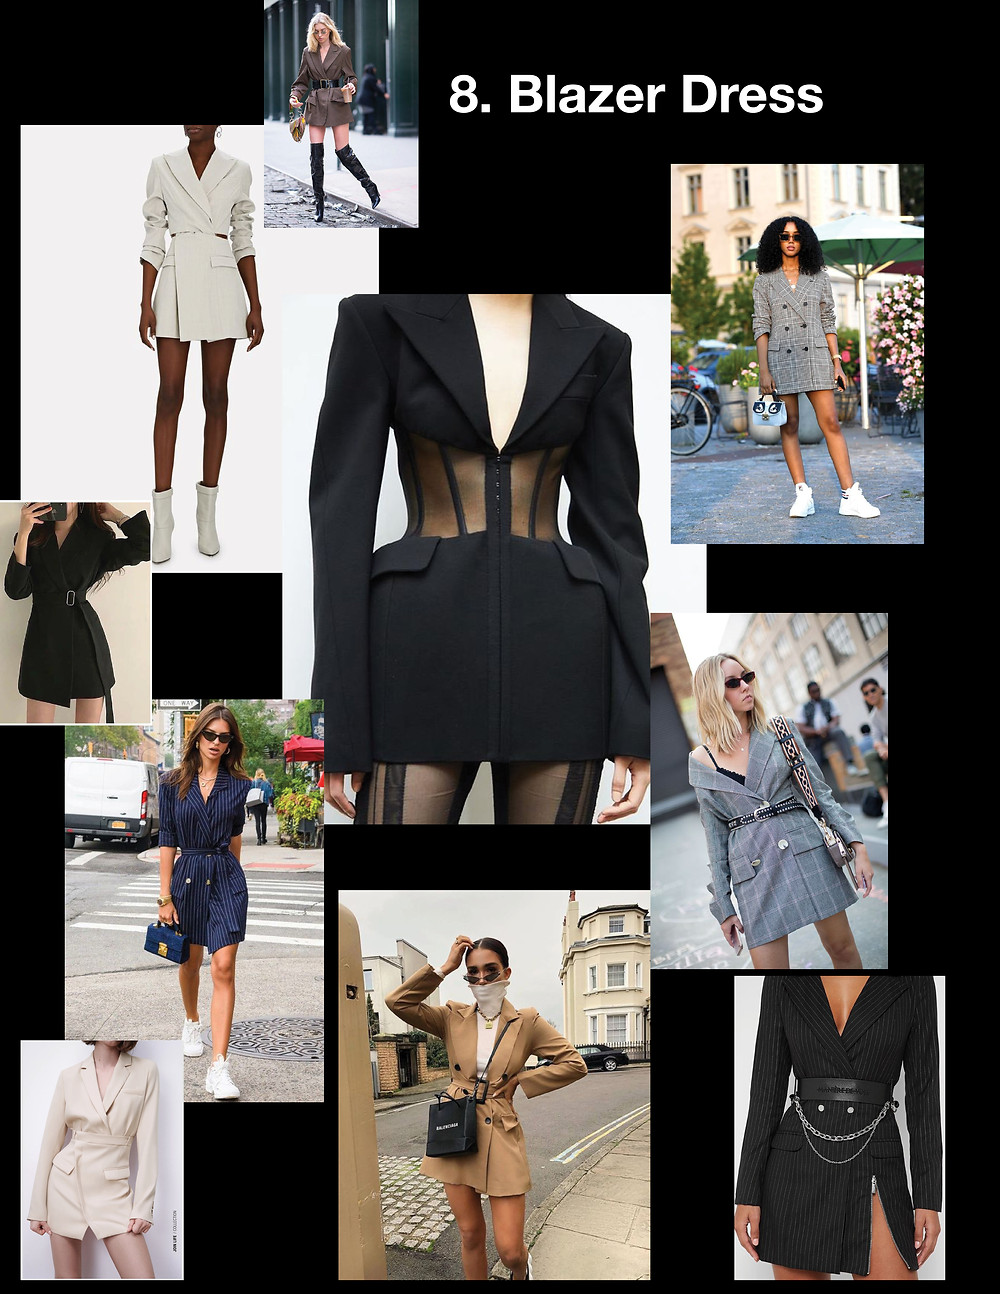 summer dresses 2021, style tips, fashion, shopping, trends, Blazer dress, Mugler